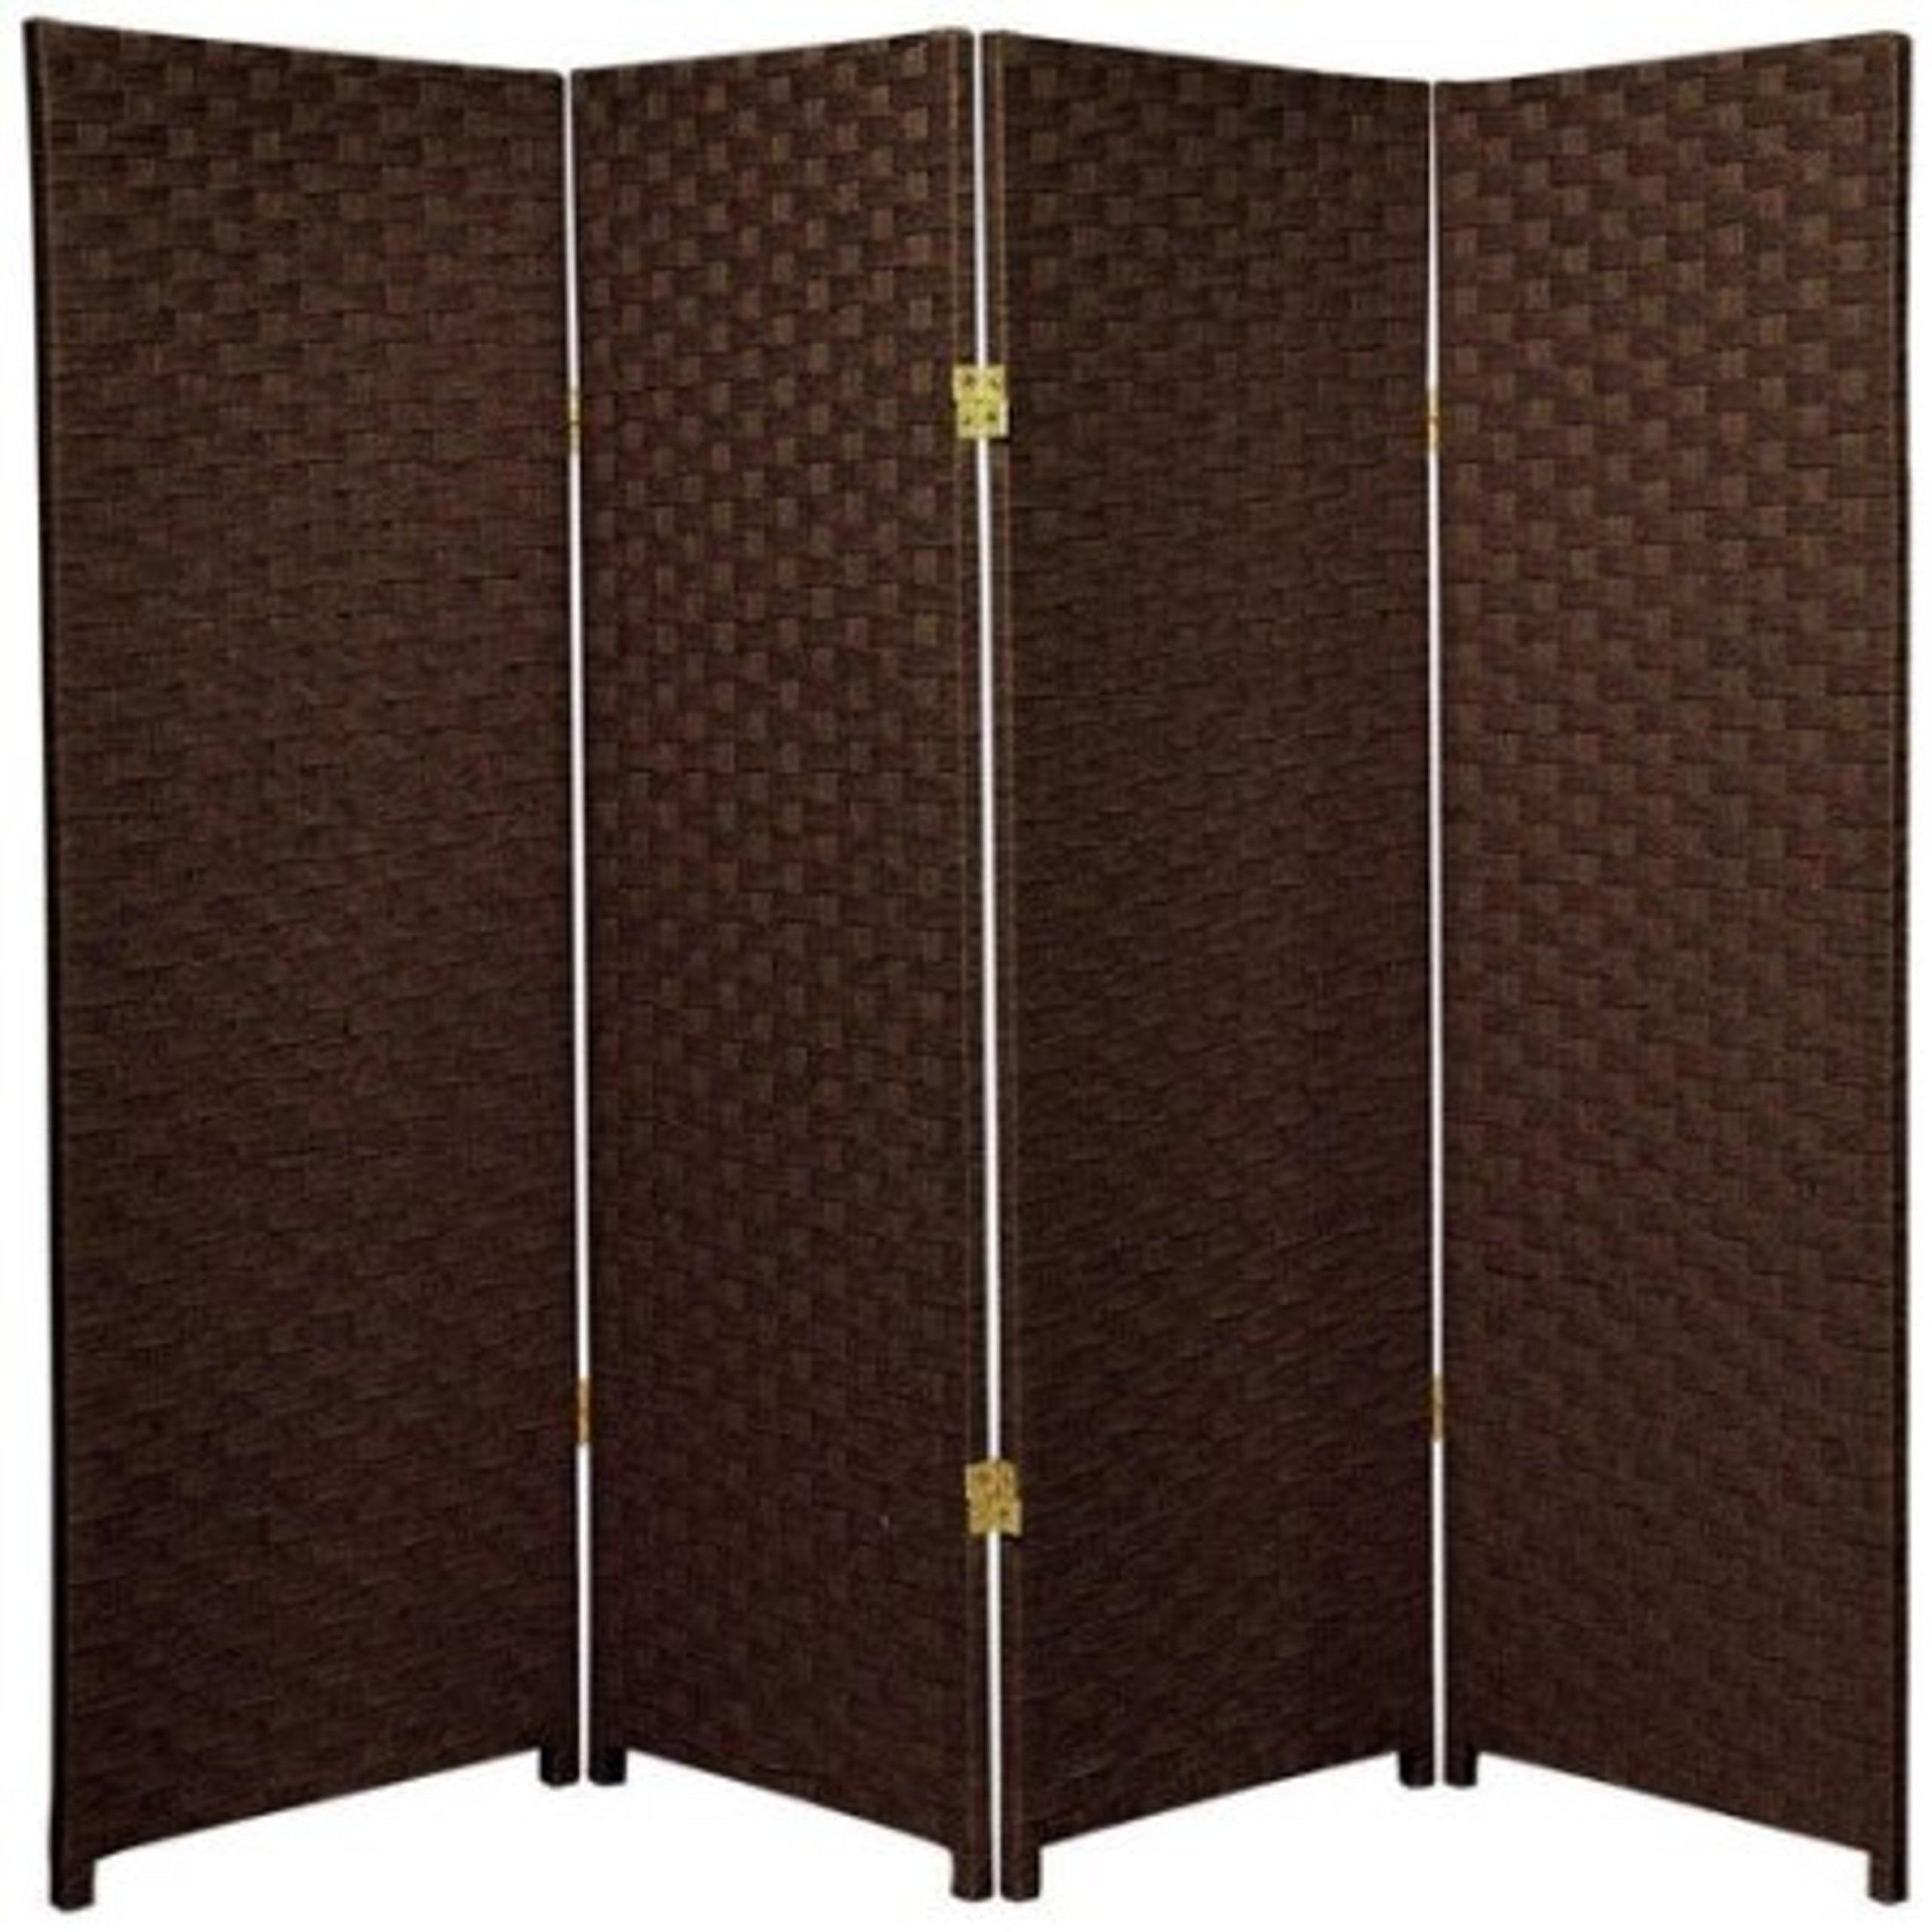 Natural Plant Fiber Woven Room Decor Dark Mocha 4 Panels Divider